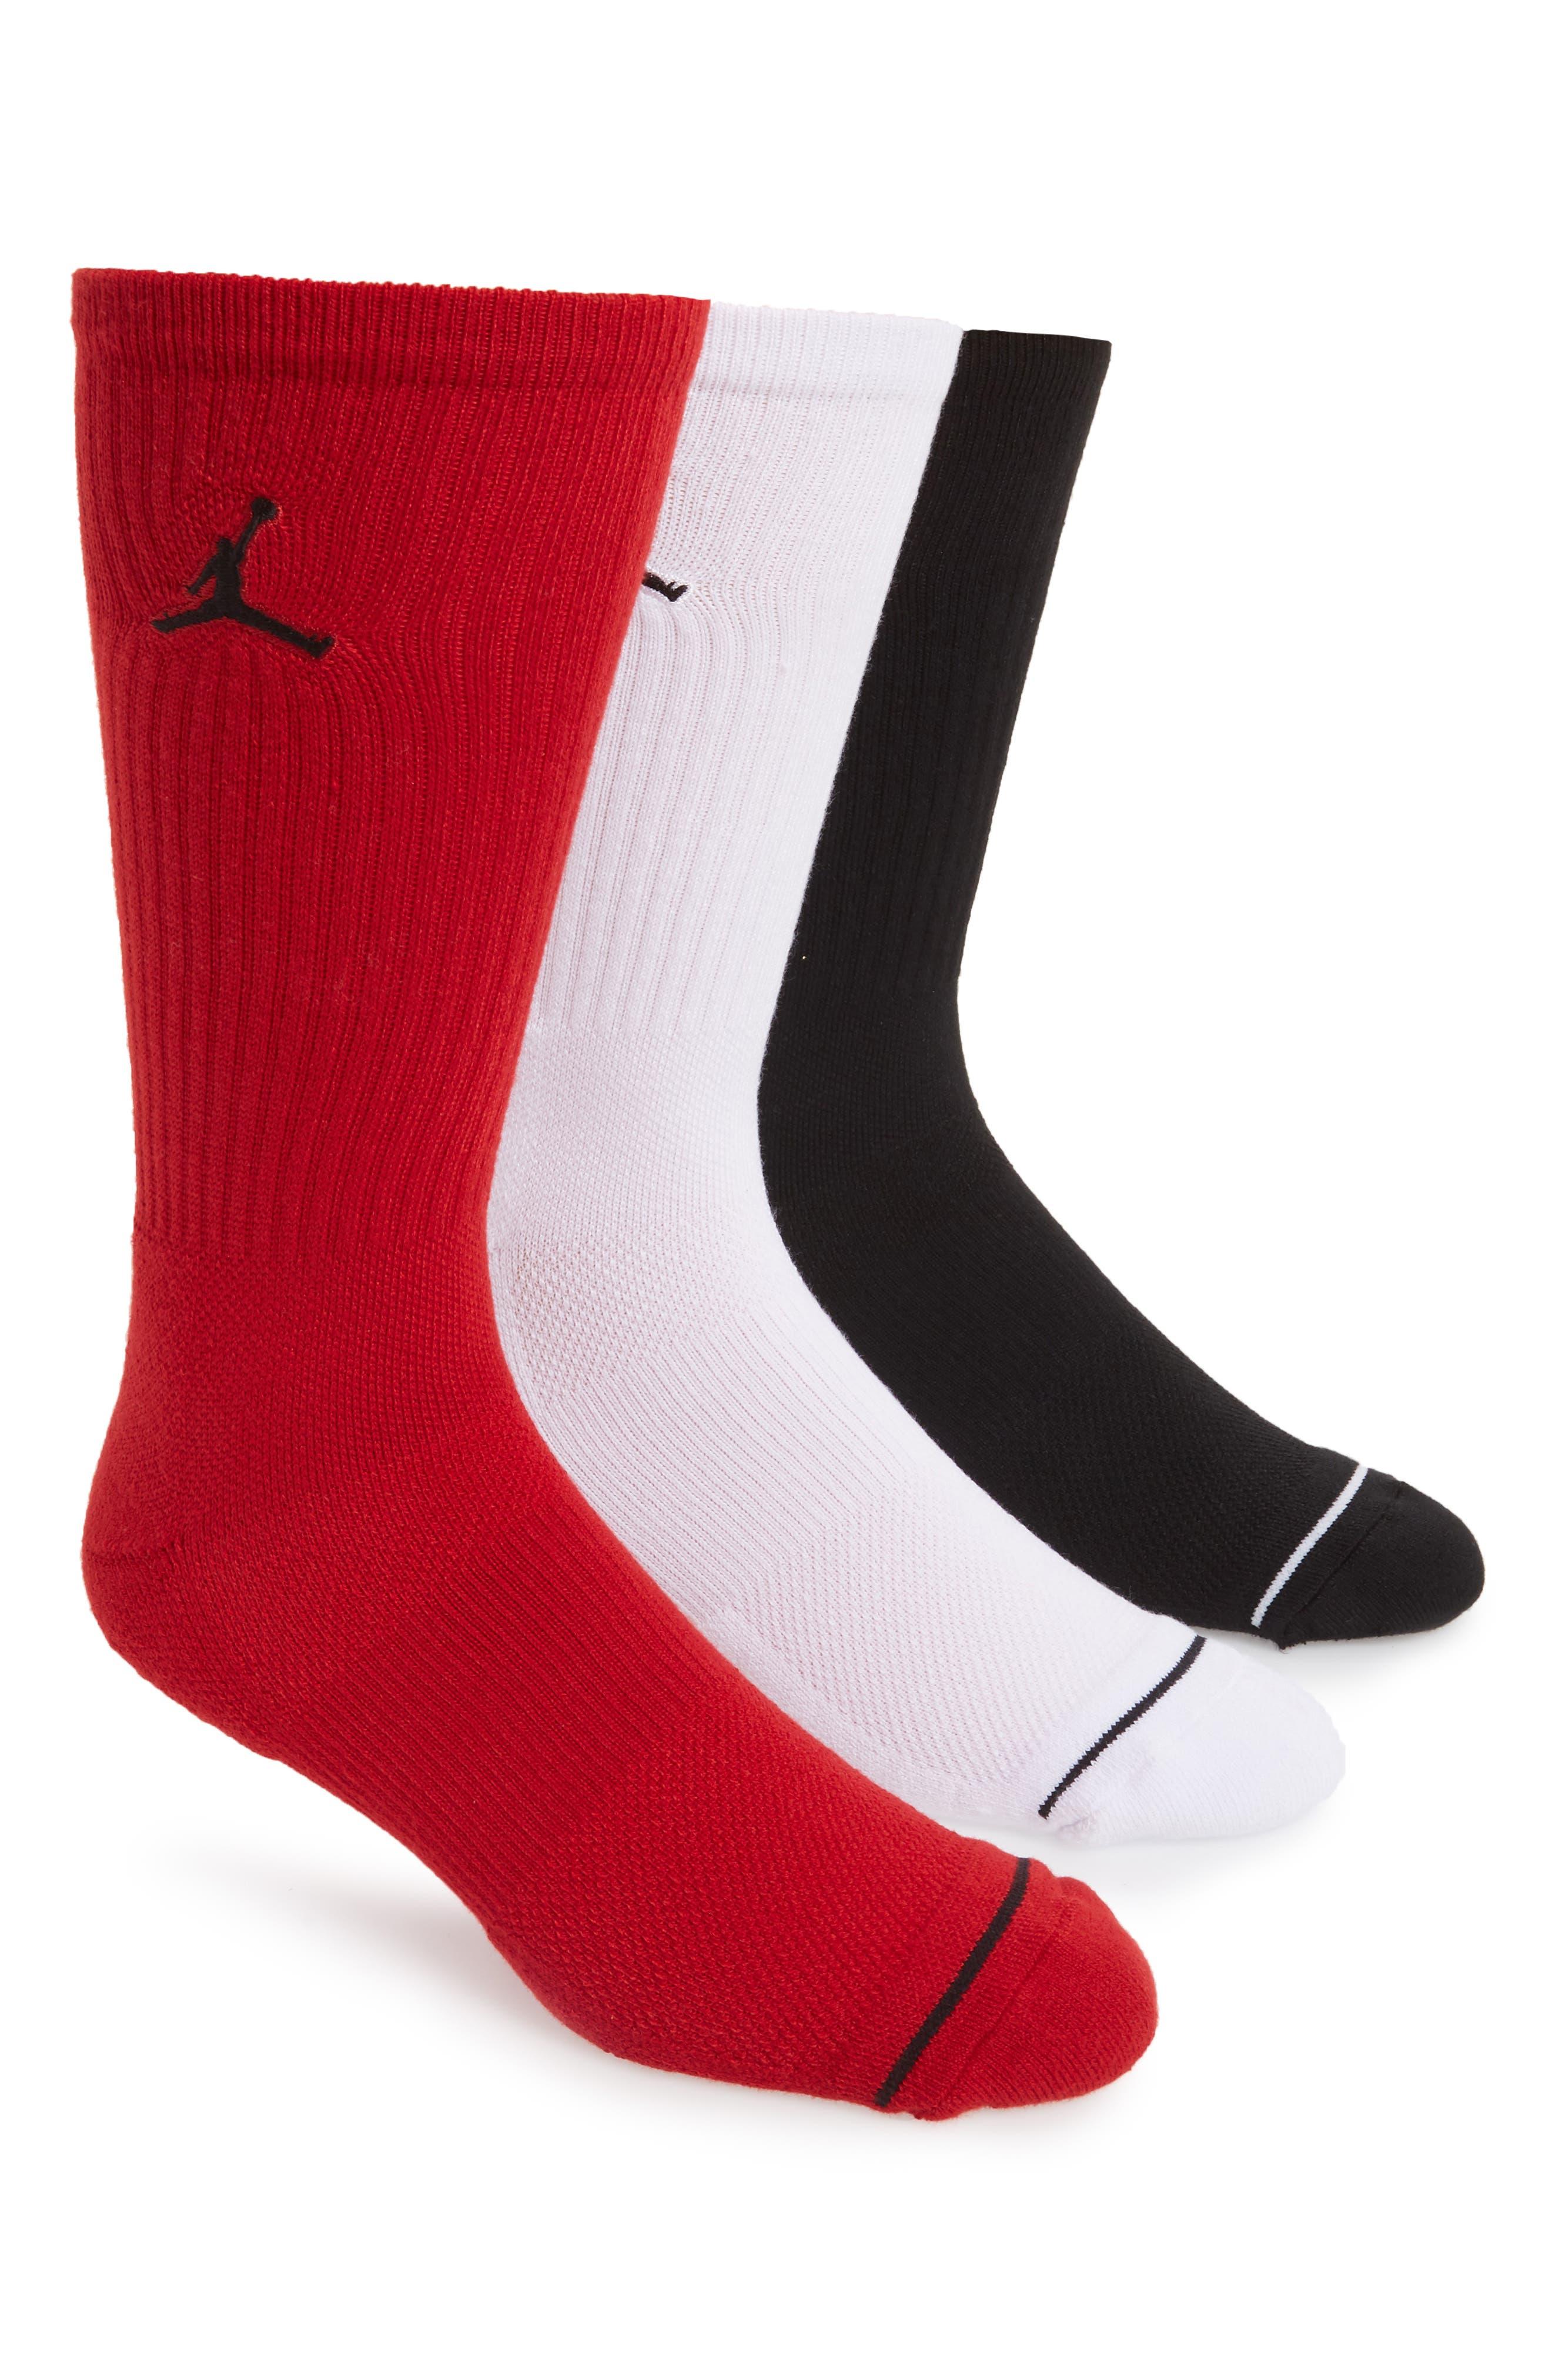 Nike Jumpman 3-Pack Dry Crew Socks